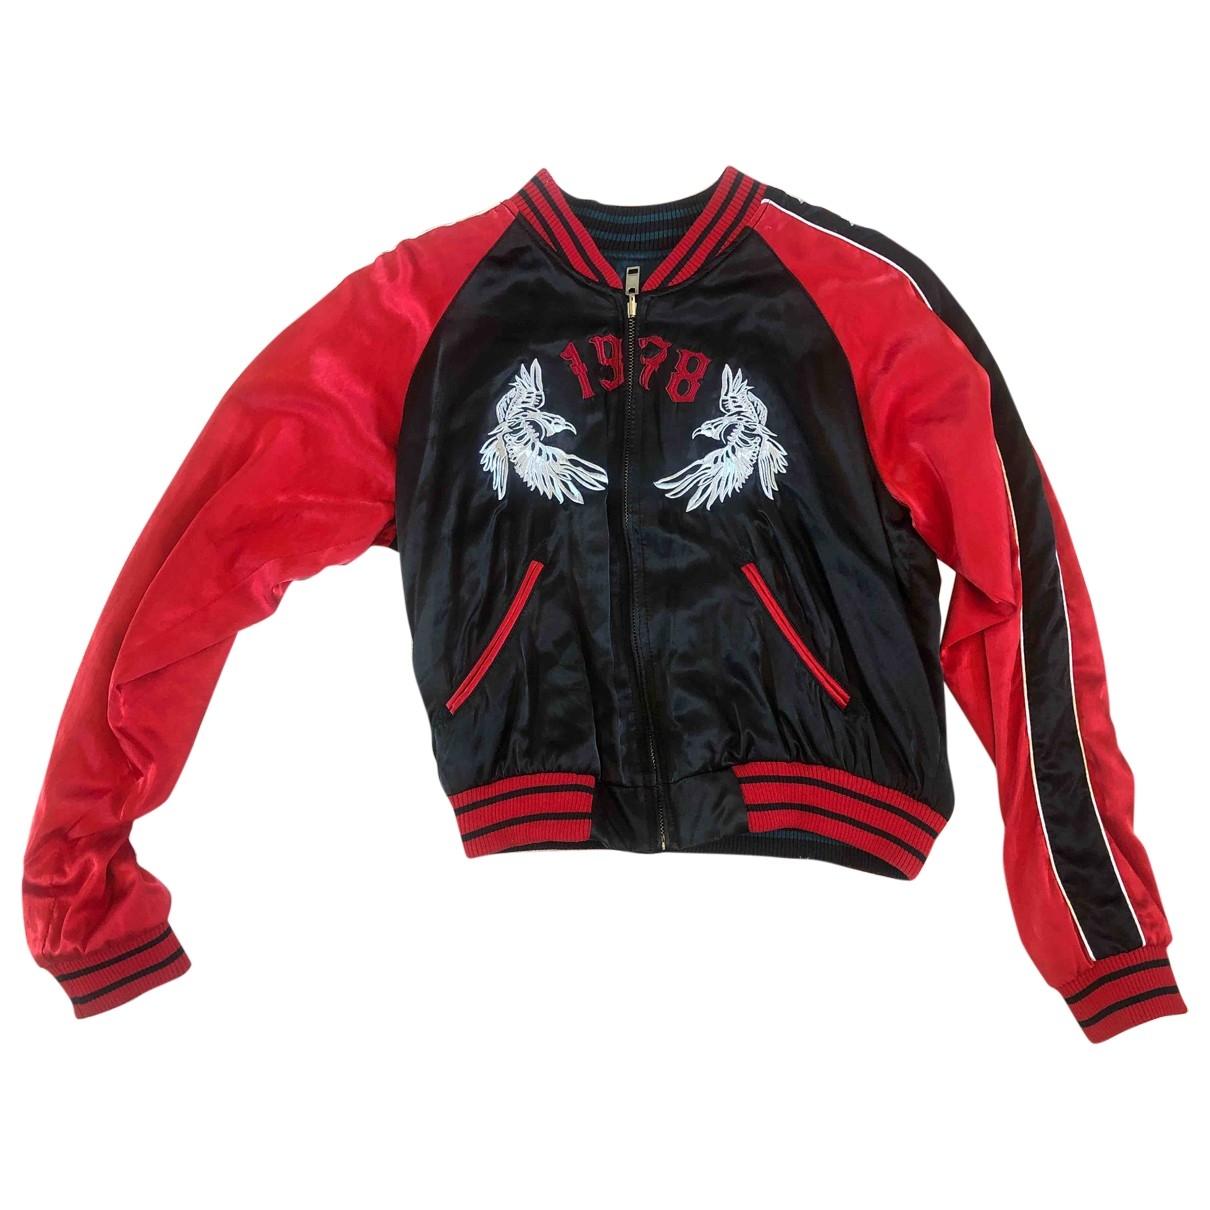 Diesel \N Multicolour jacket for Women M International